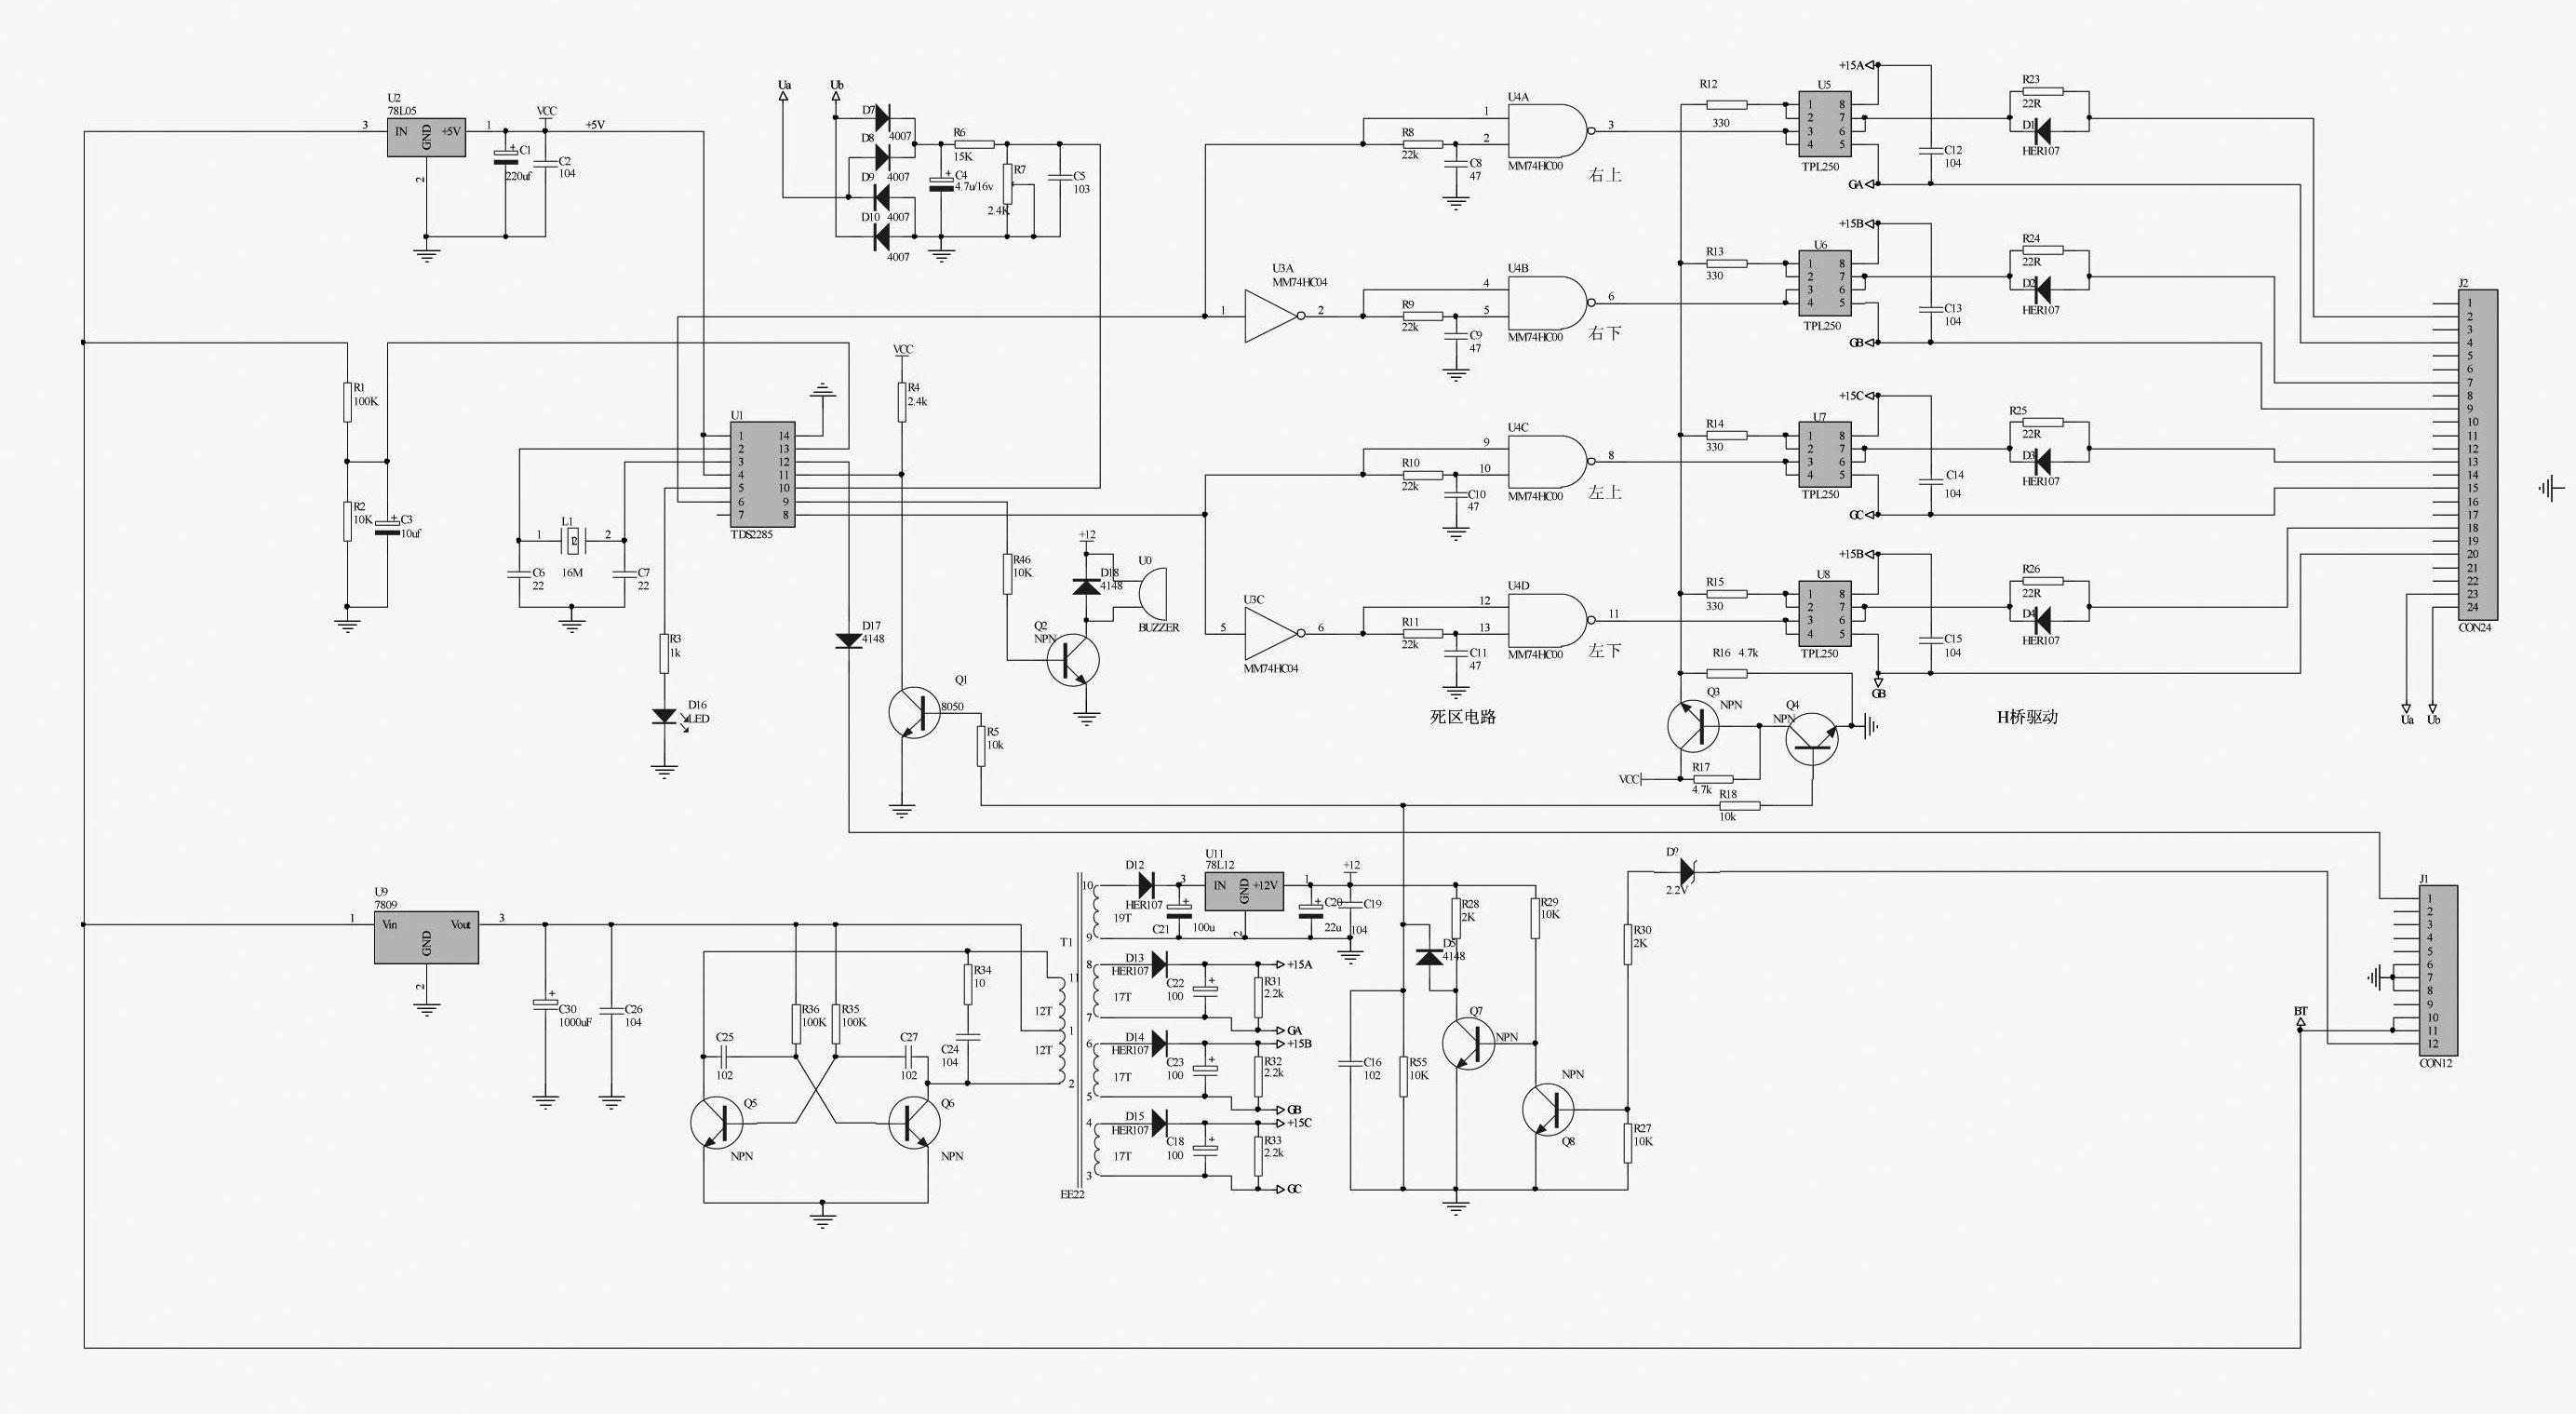 home power saver circuit diagram ear label print out 1000w 12v dc inverter board design